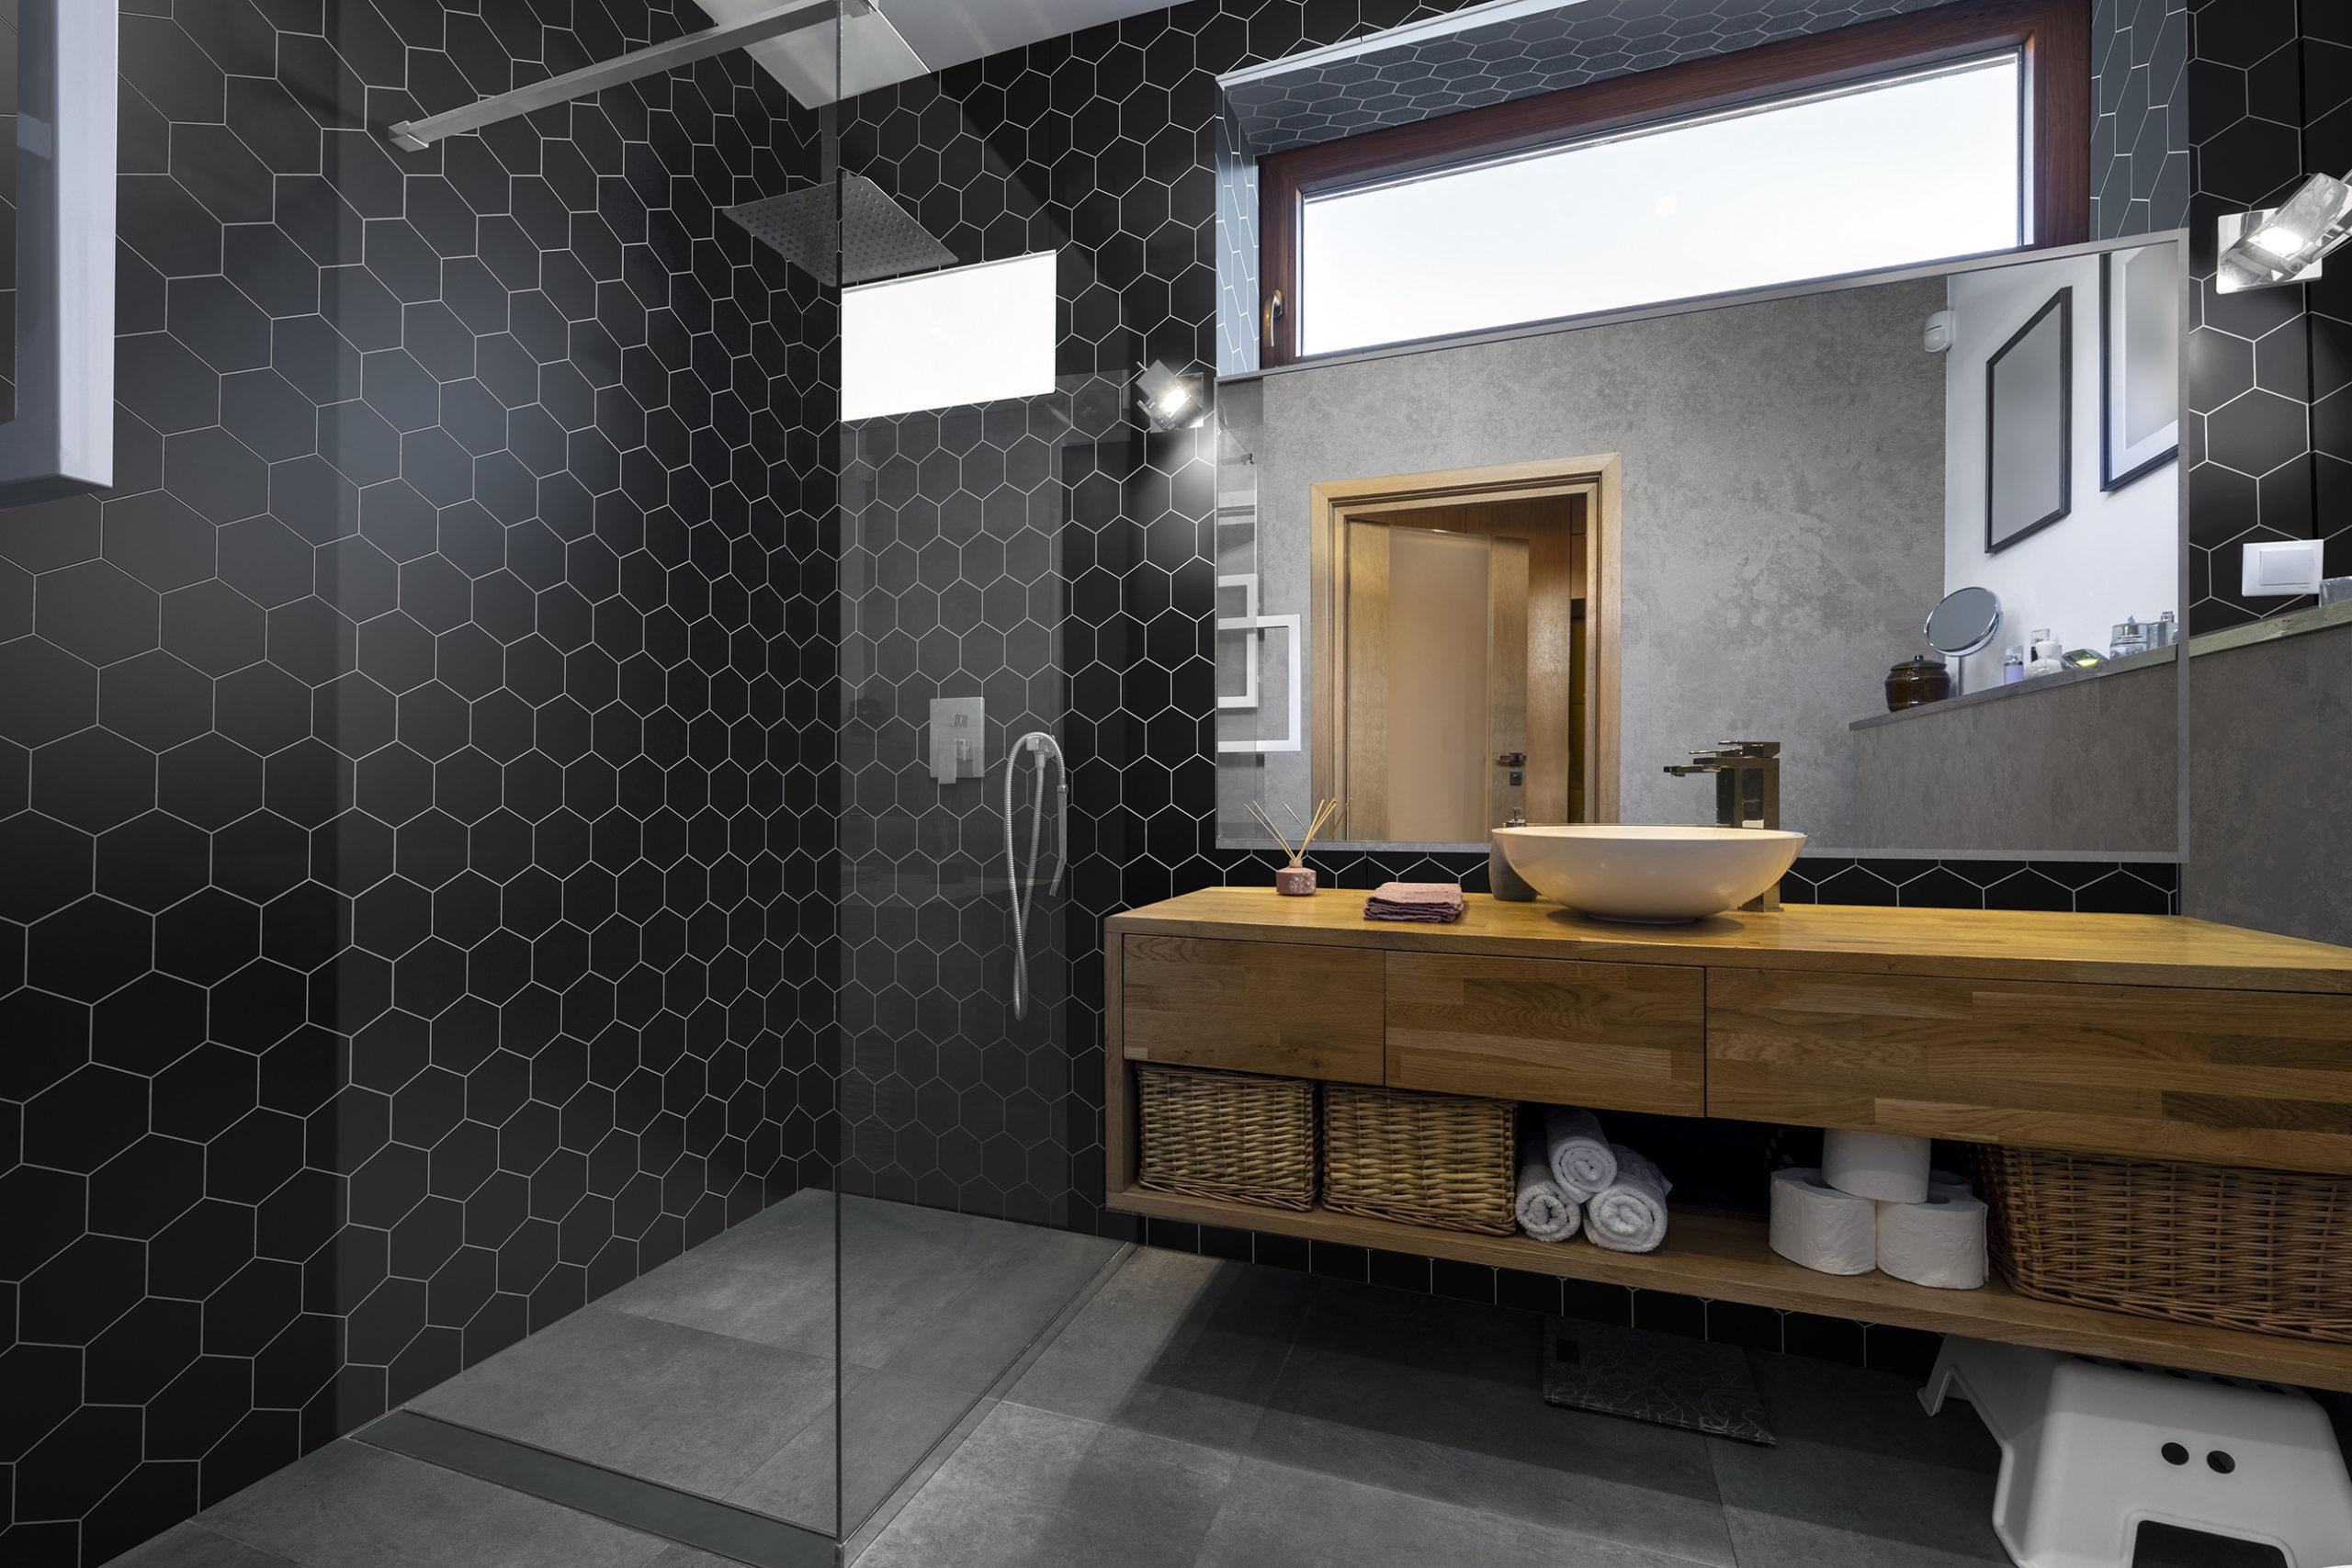 Leading waterproof wall panel manufacturer Fibo joins Virtual Worlds